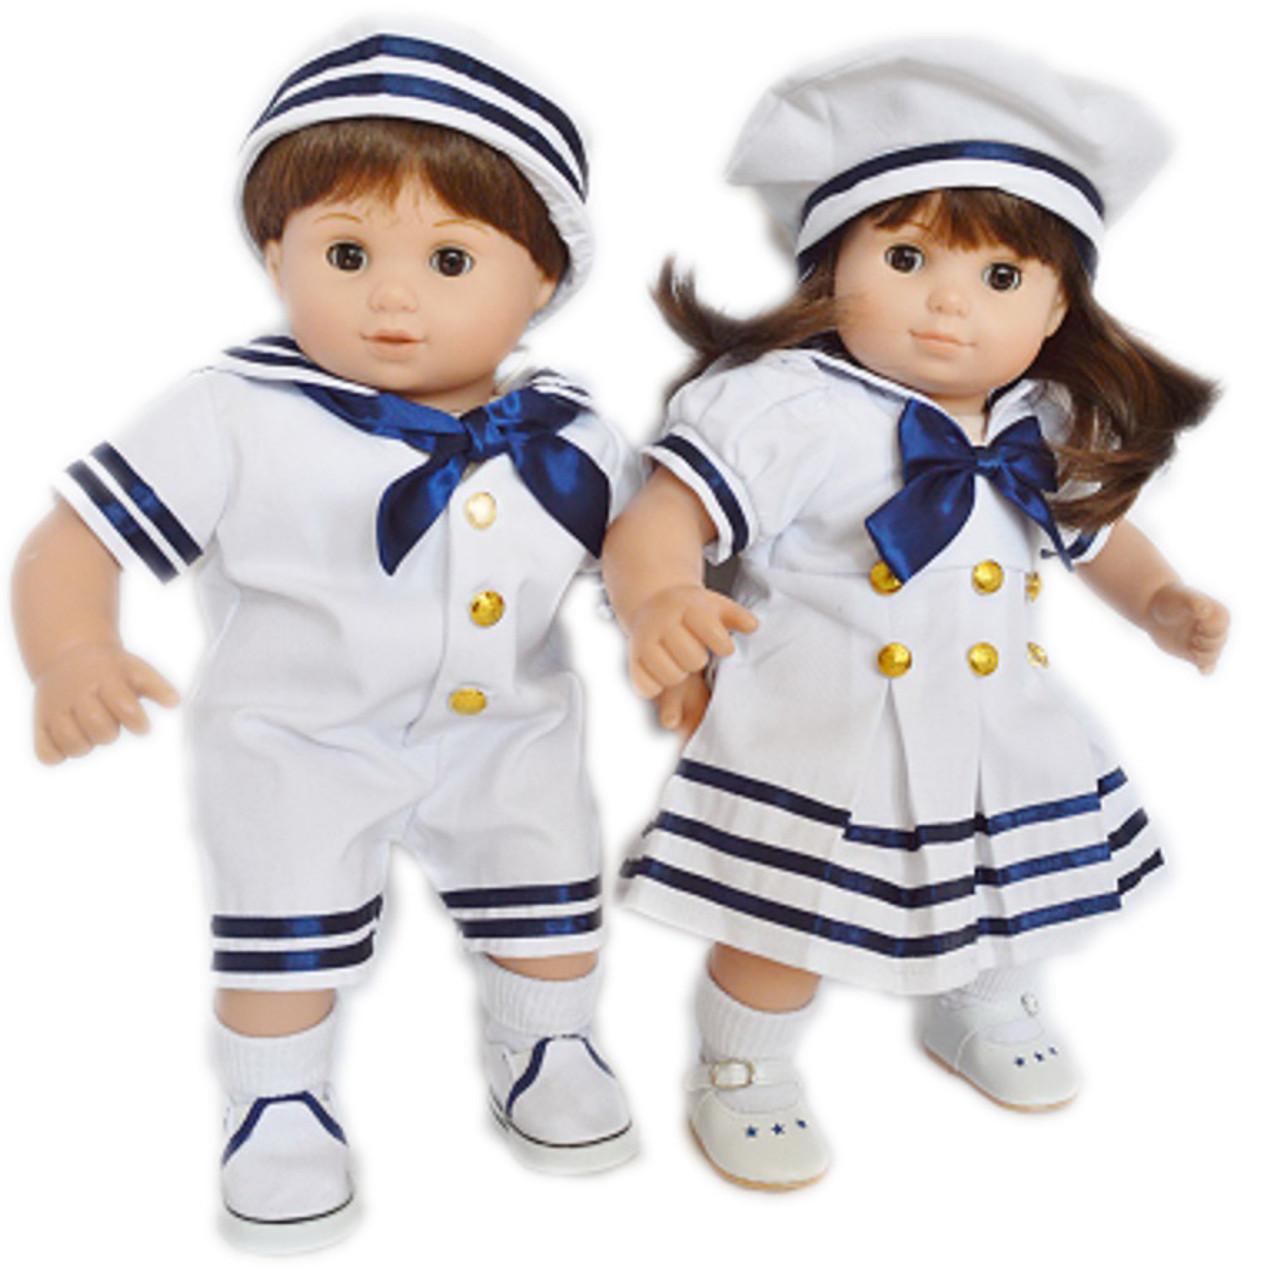 dbd3776d5 Nautical Set For American Girl Dolls Bitty Twins